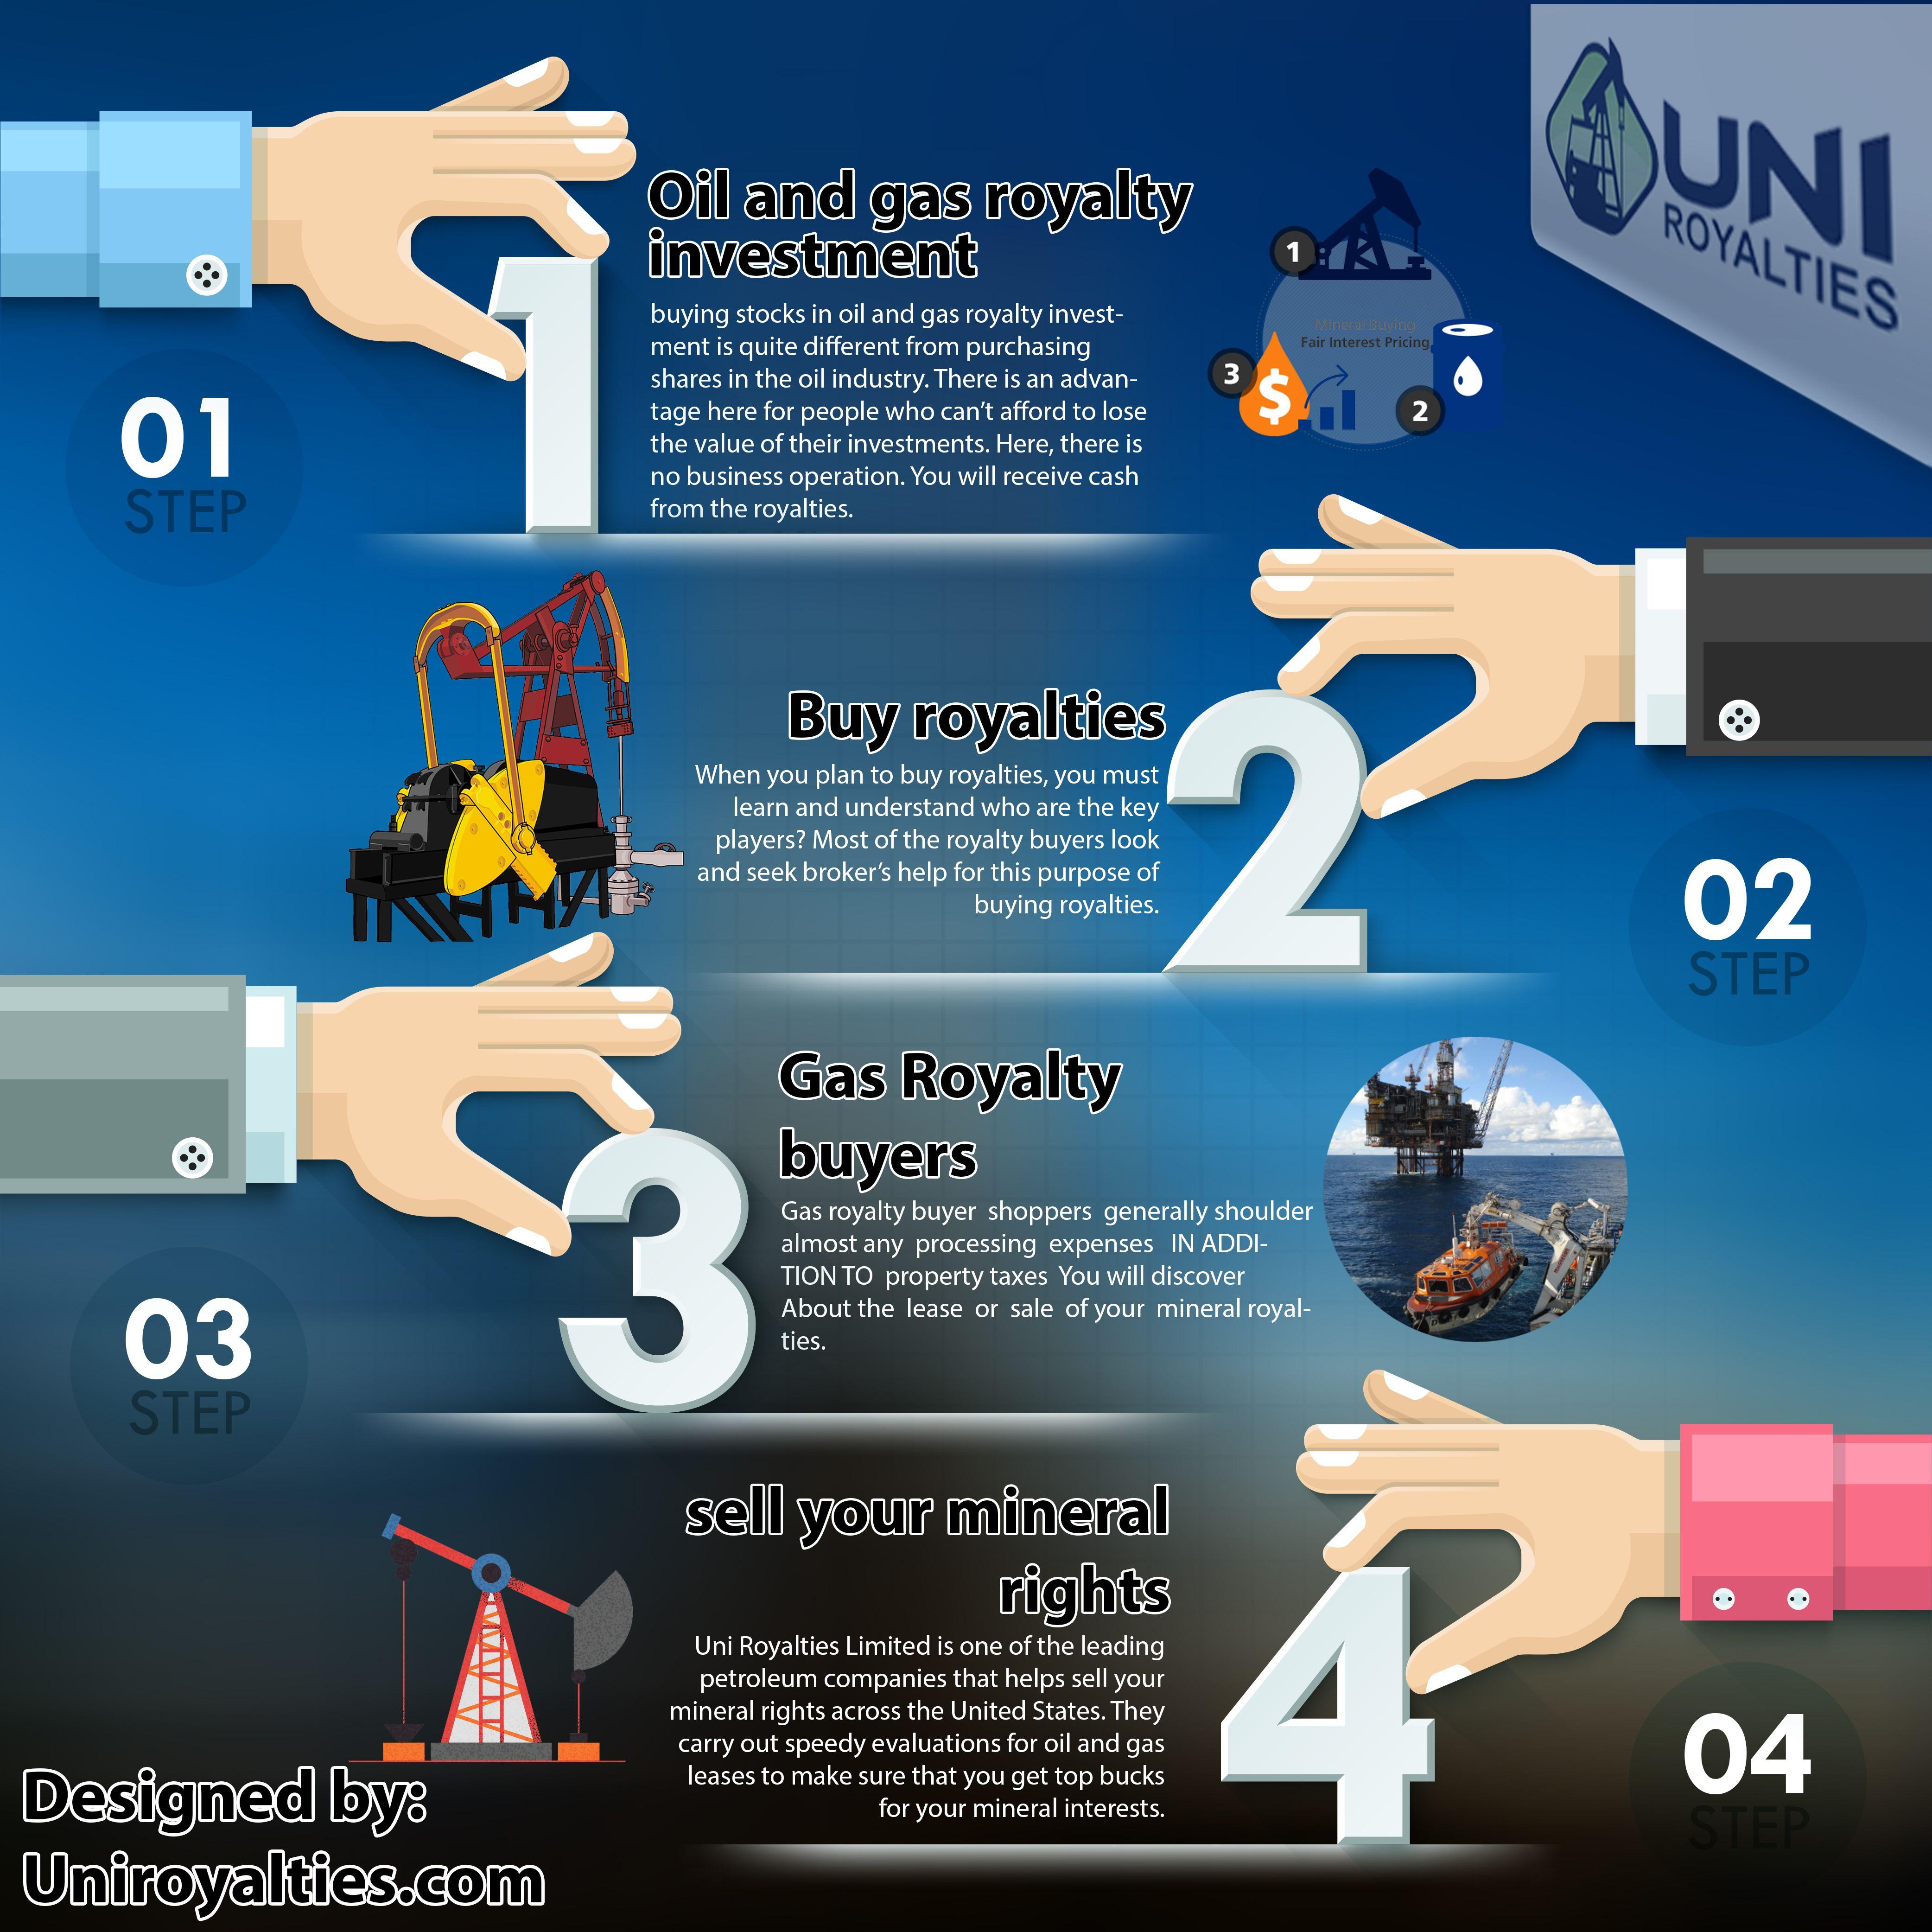 Pin by Uni Royalties on Uni Royalties Infographics | Oil